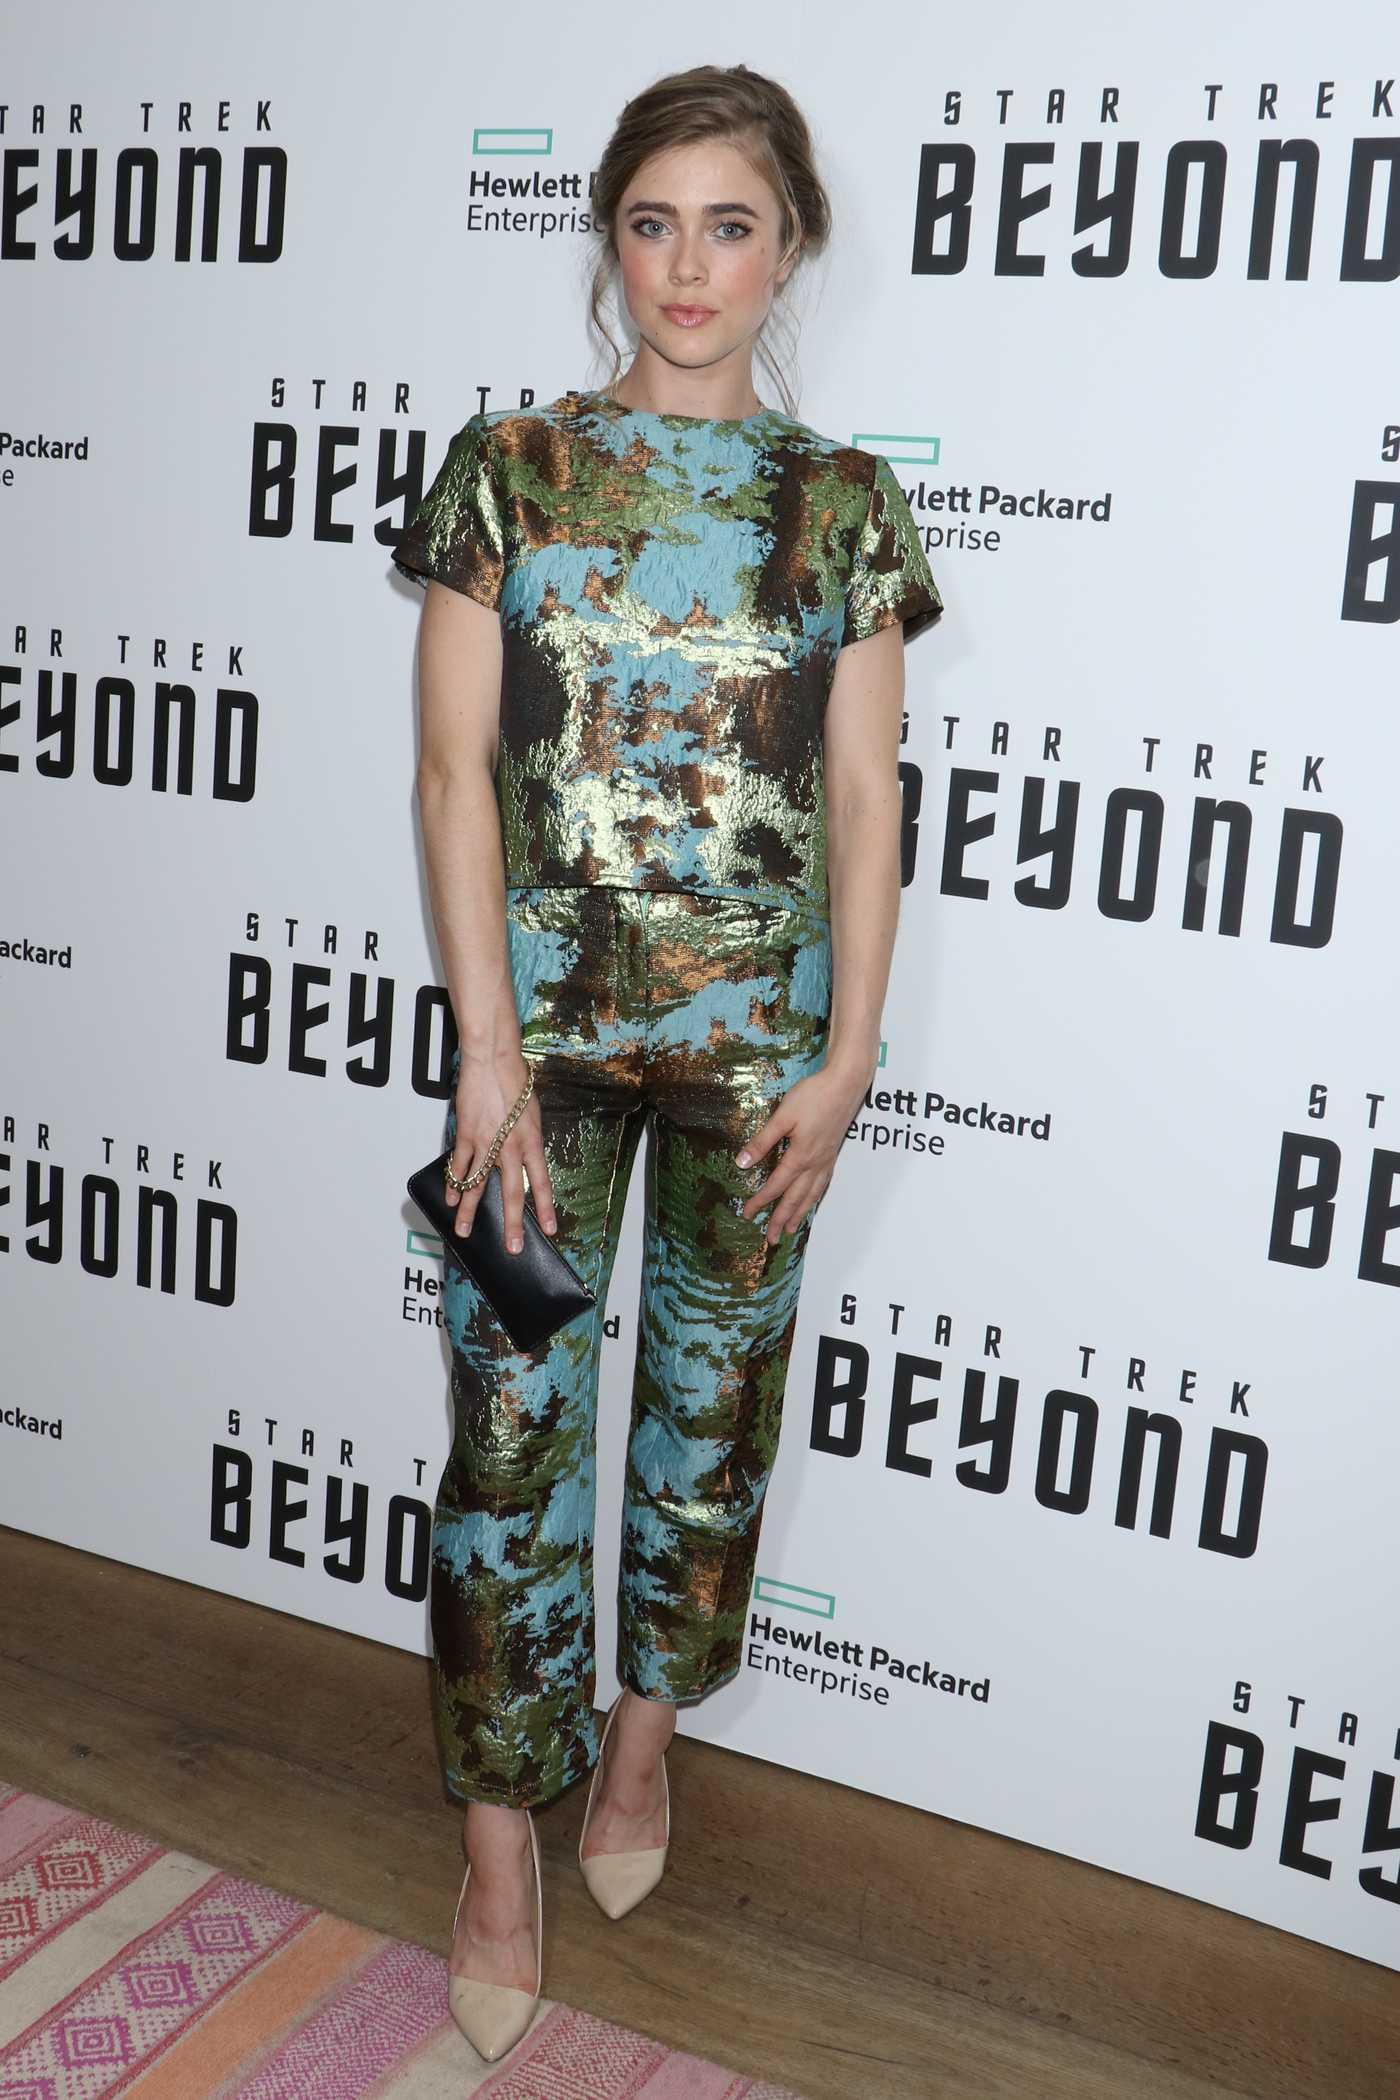 Melissa Roxburgh at the Star Trek: Beyond Screening in New York City 07/18/2016